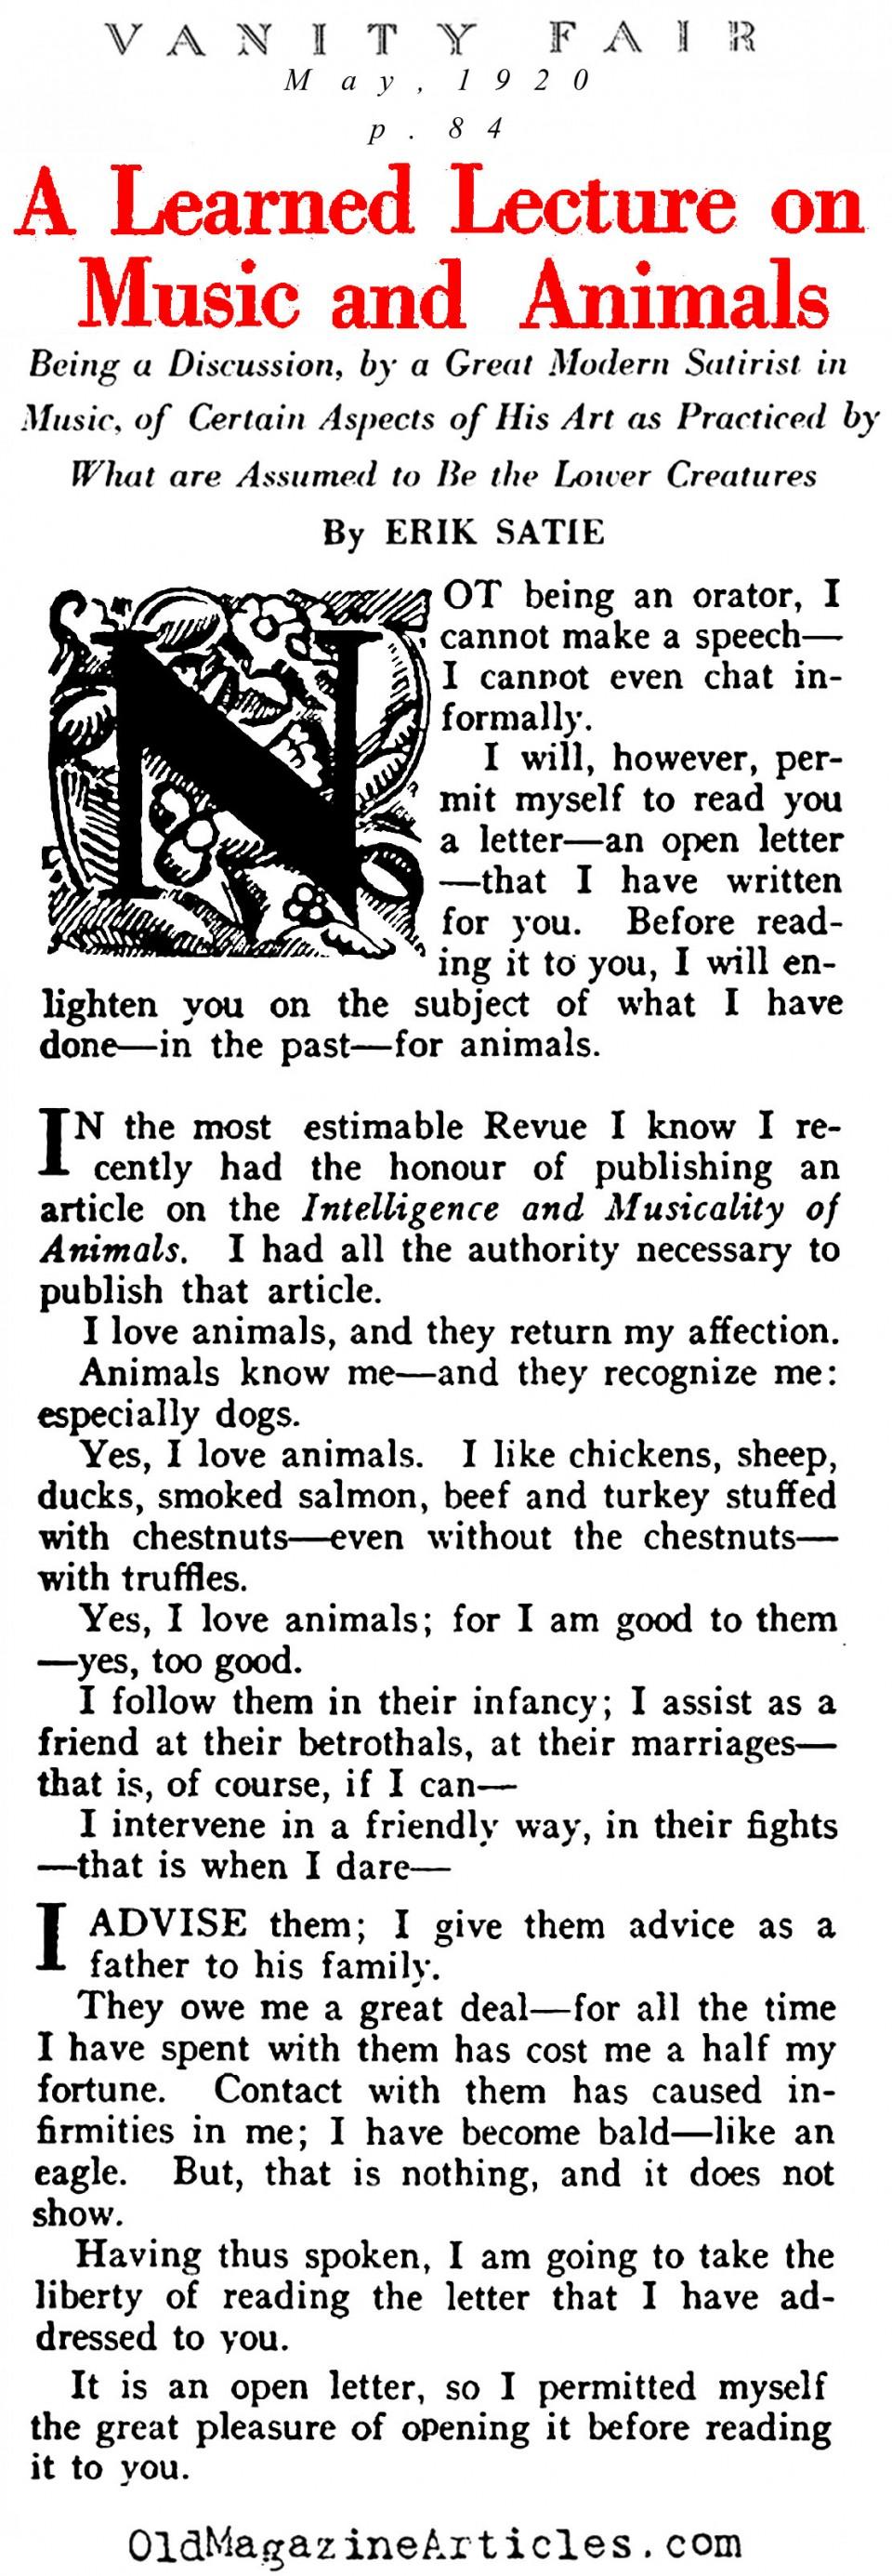 002 Essay On Vanity Example Music Animals 0001 Stupendous Definition Fair Montaigne's 960